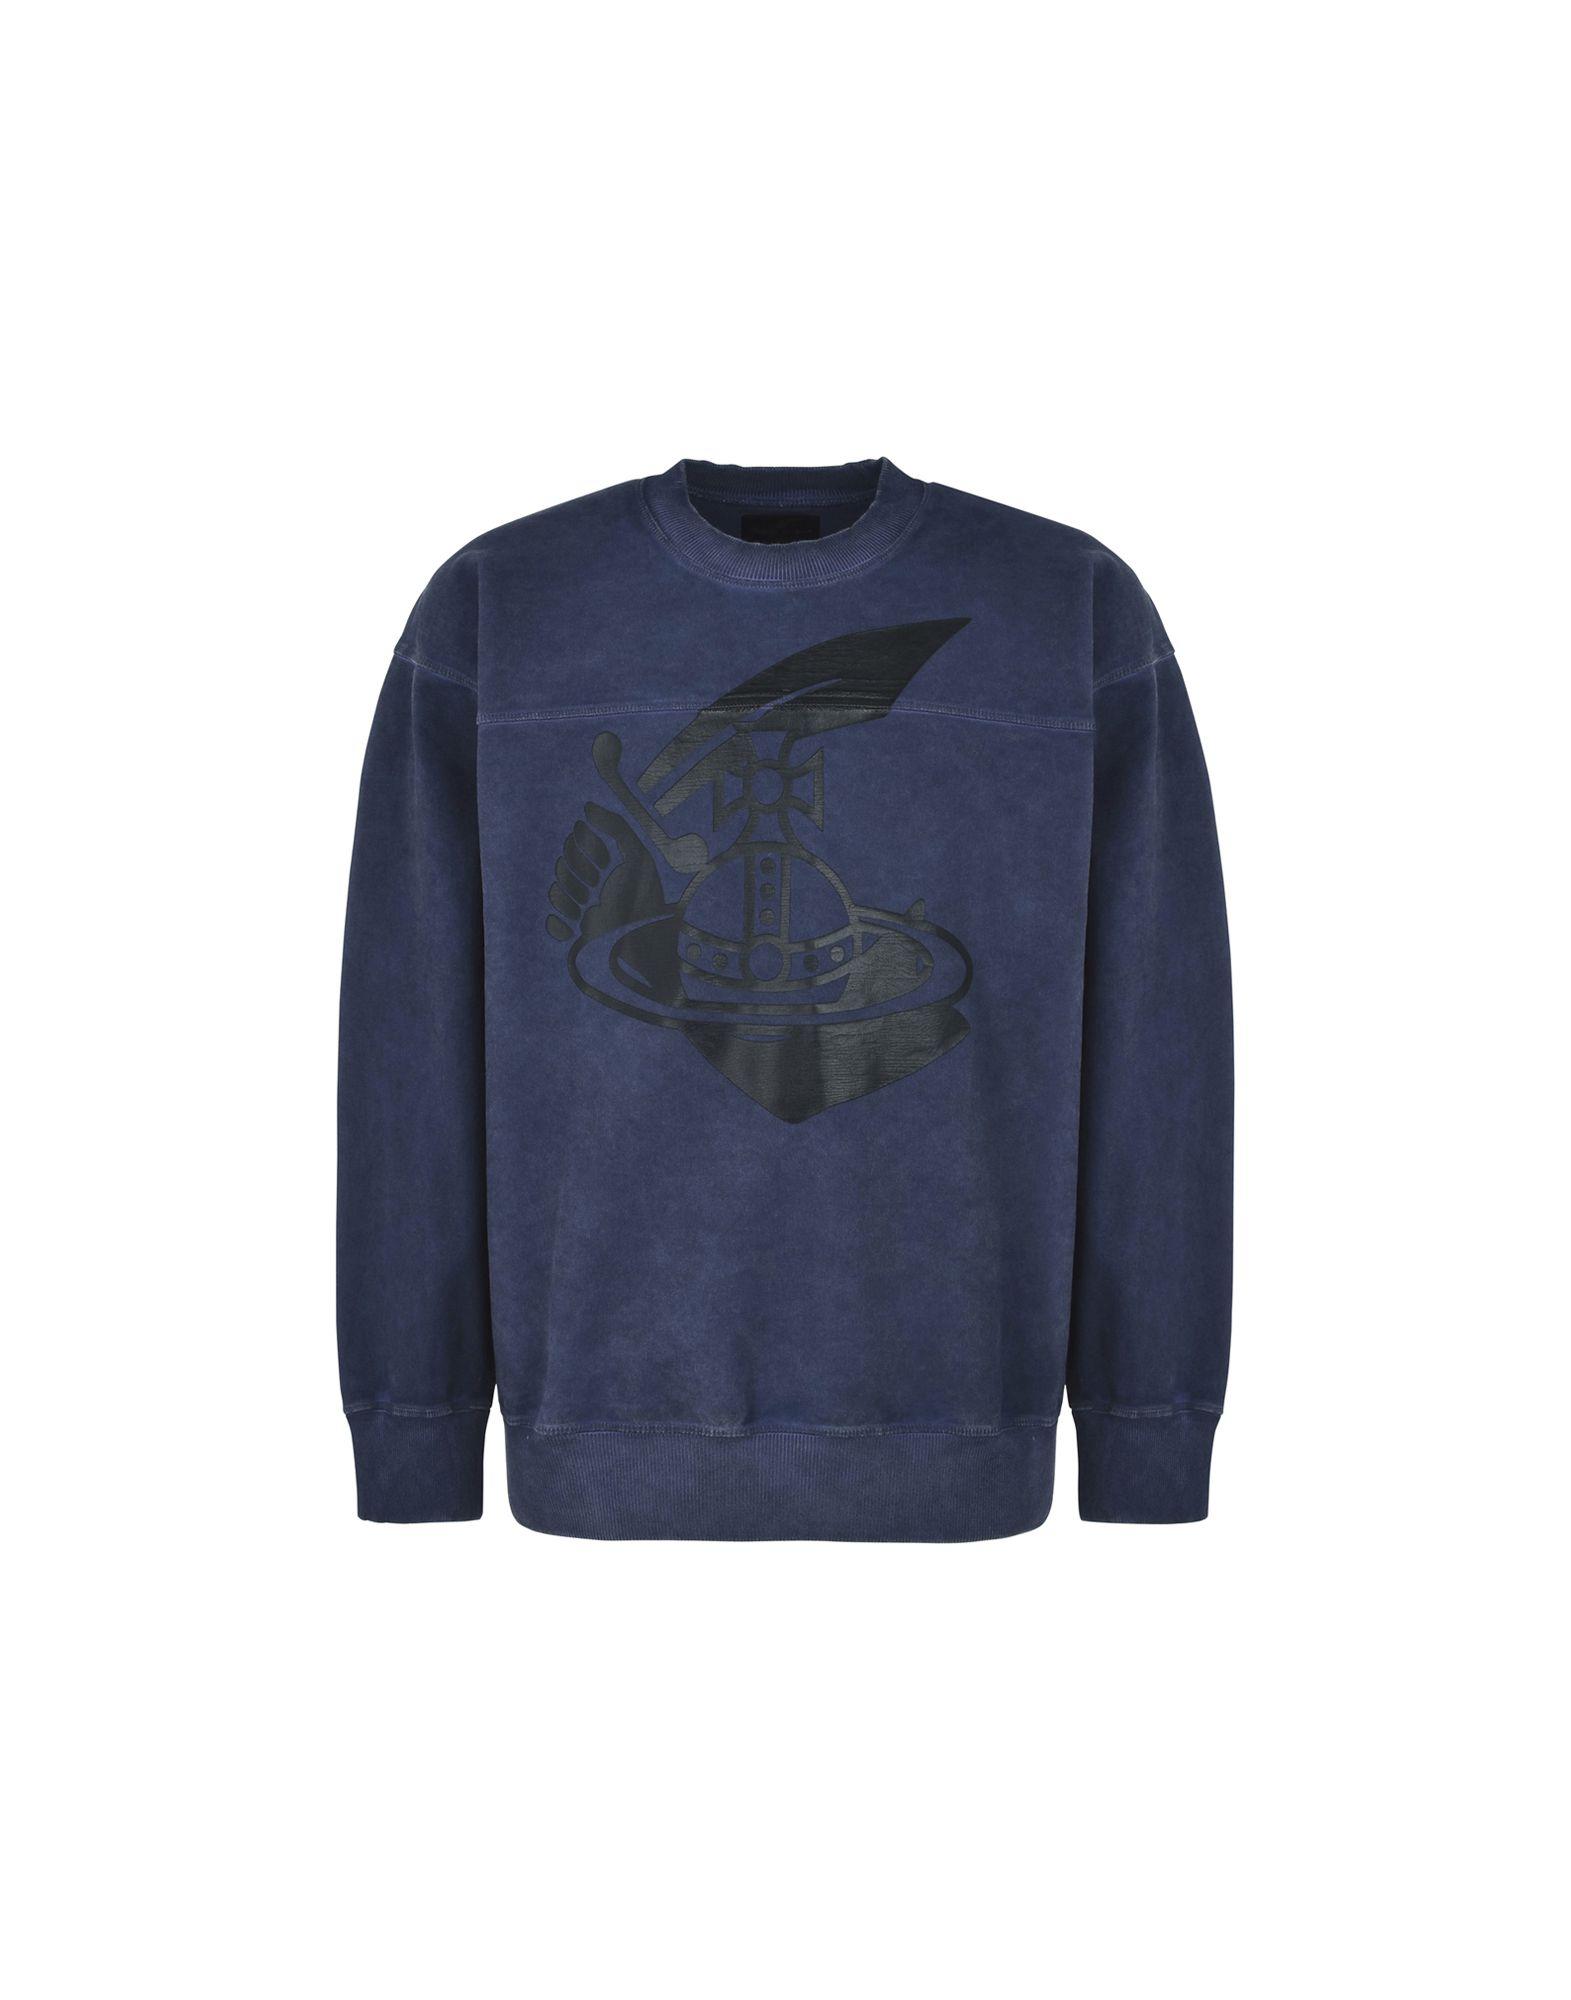 Felpa Vivienne Westwood Anglomania Square Sweater Arm & Cutlass Print - Uomo - Acquista online su